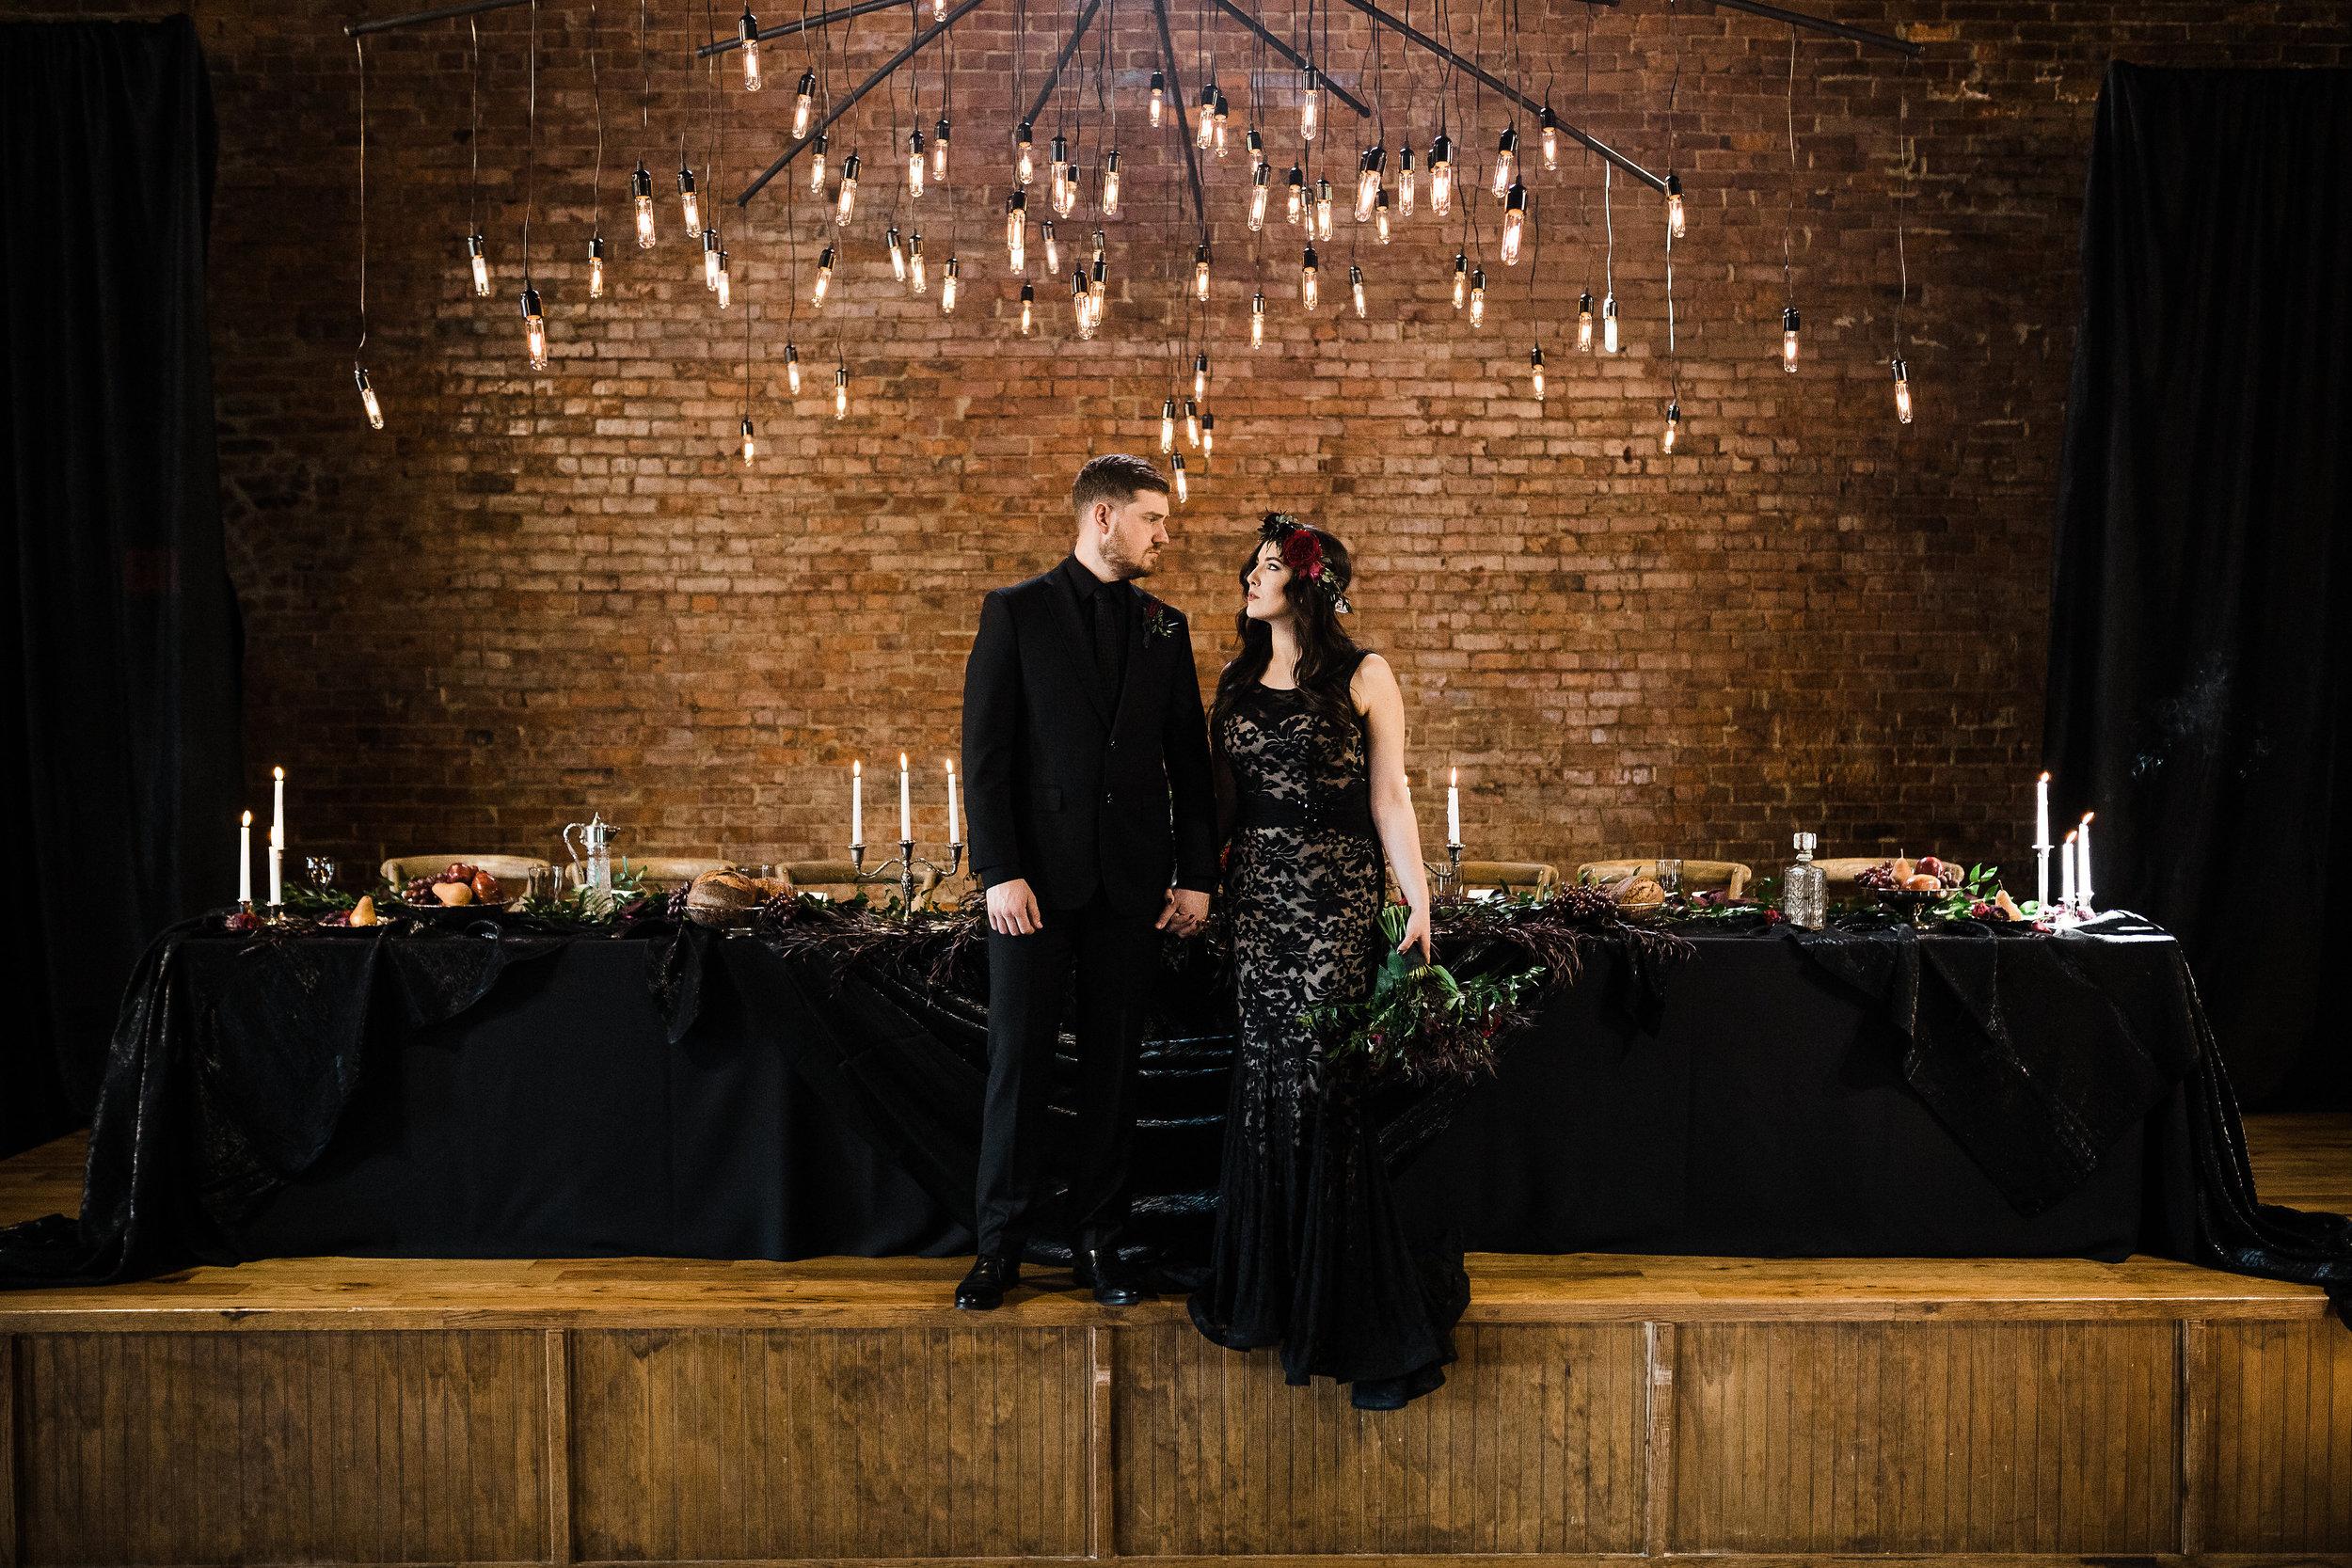 Moody Wedding Inspiration at The Church on Main